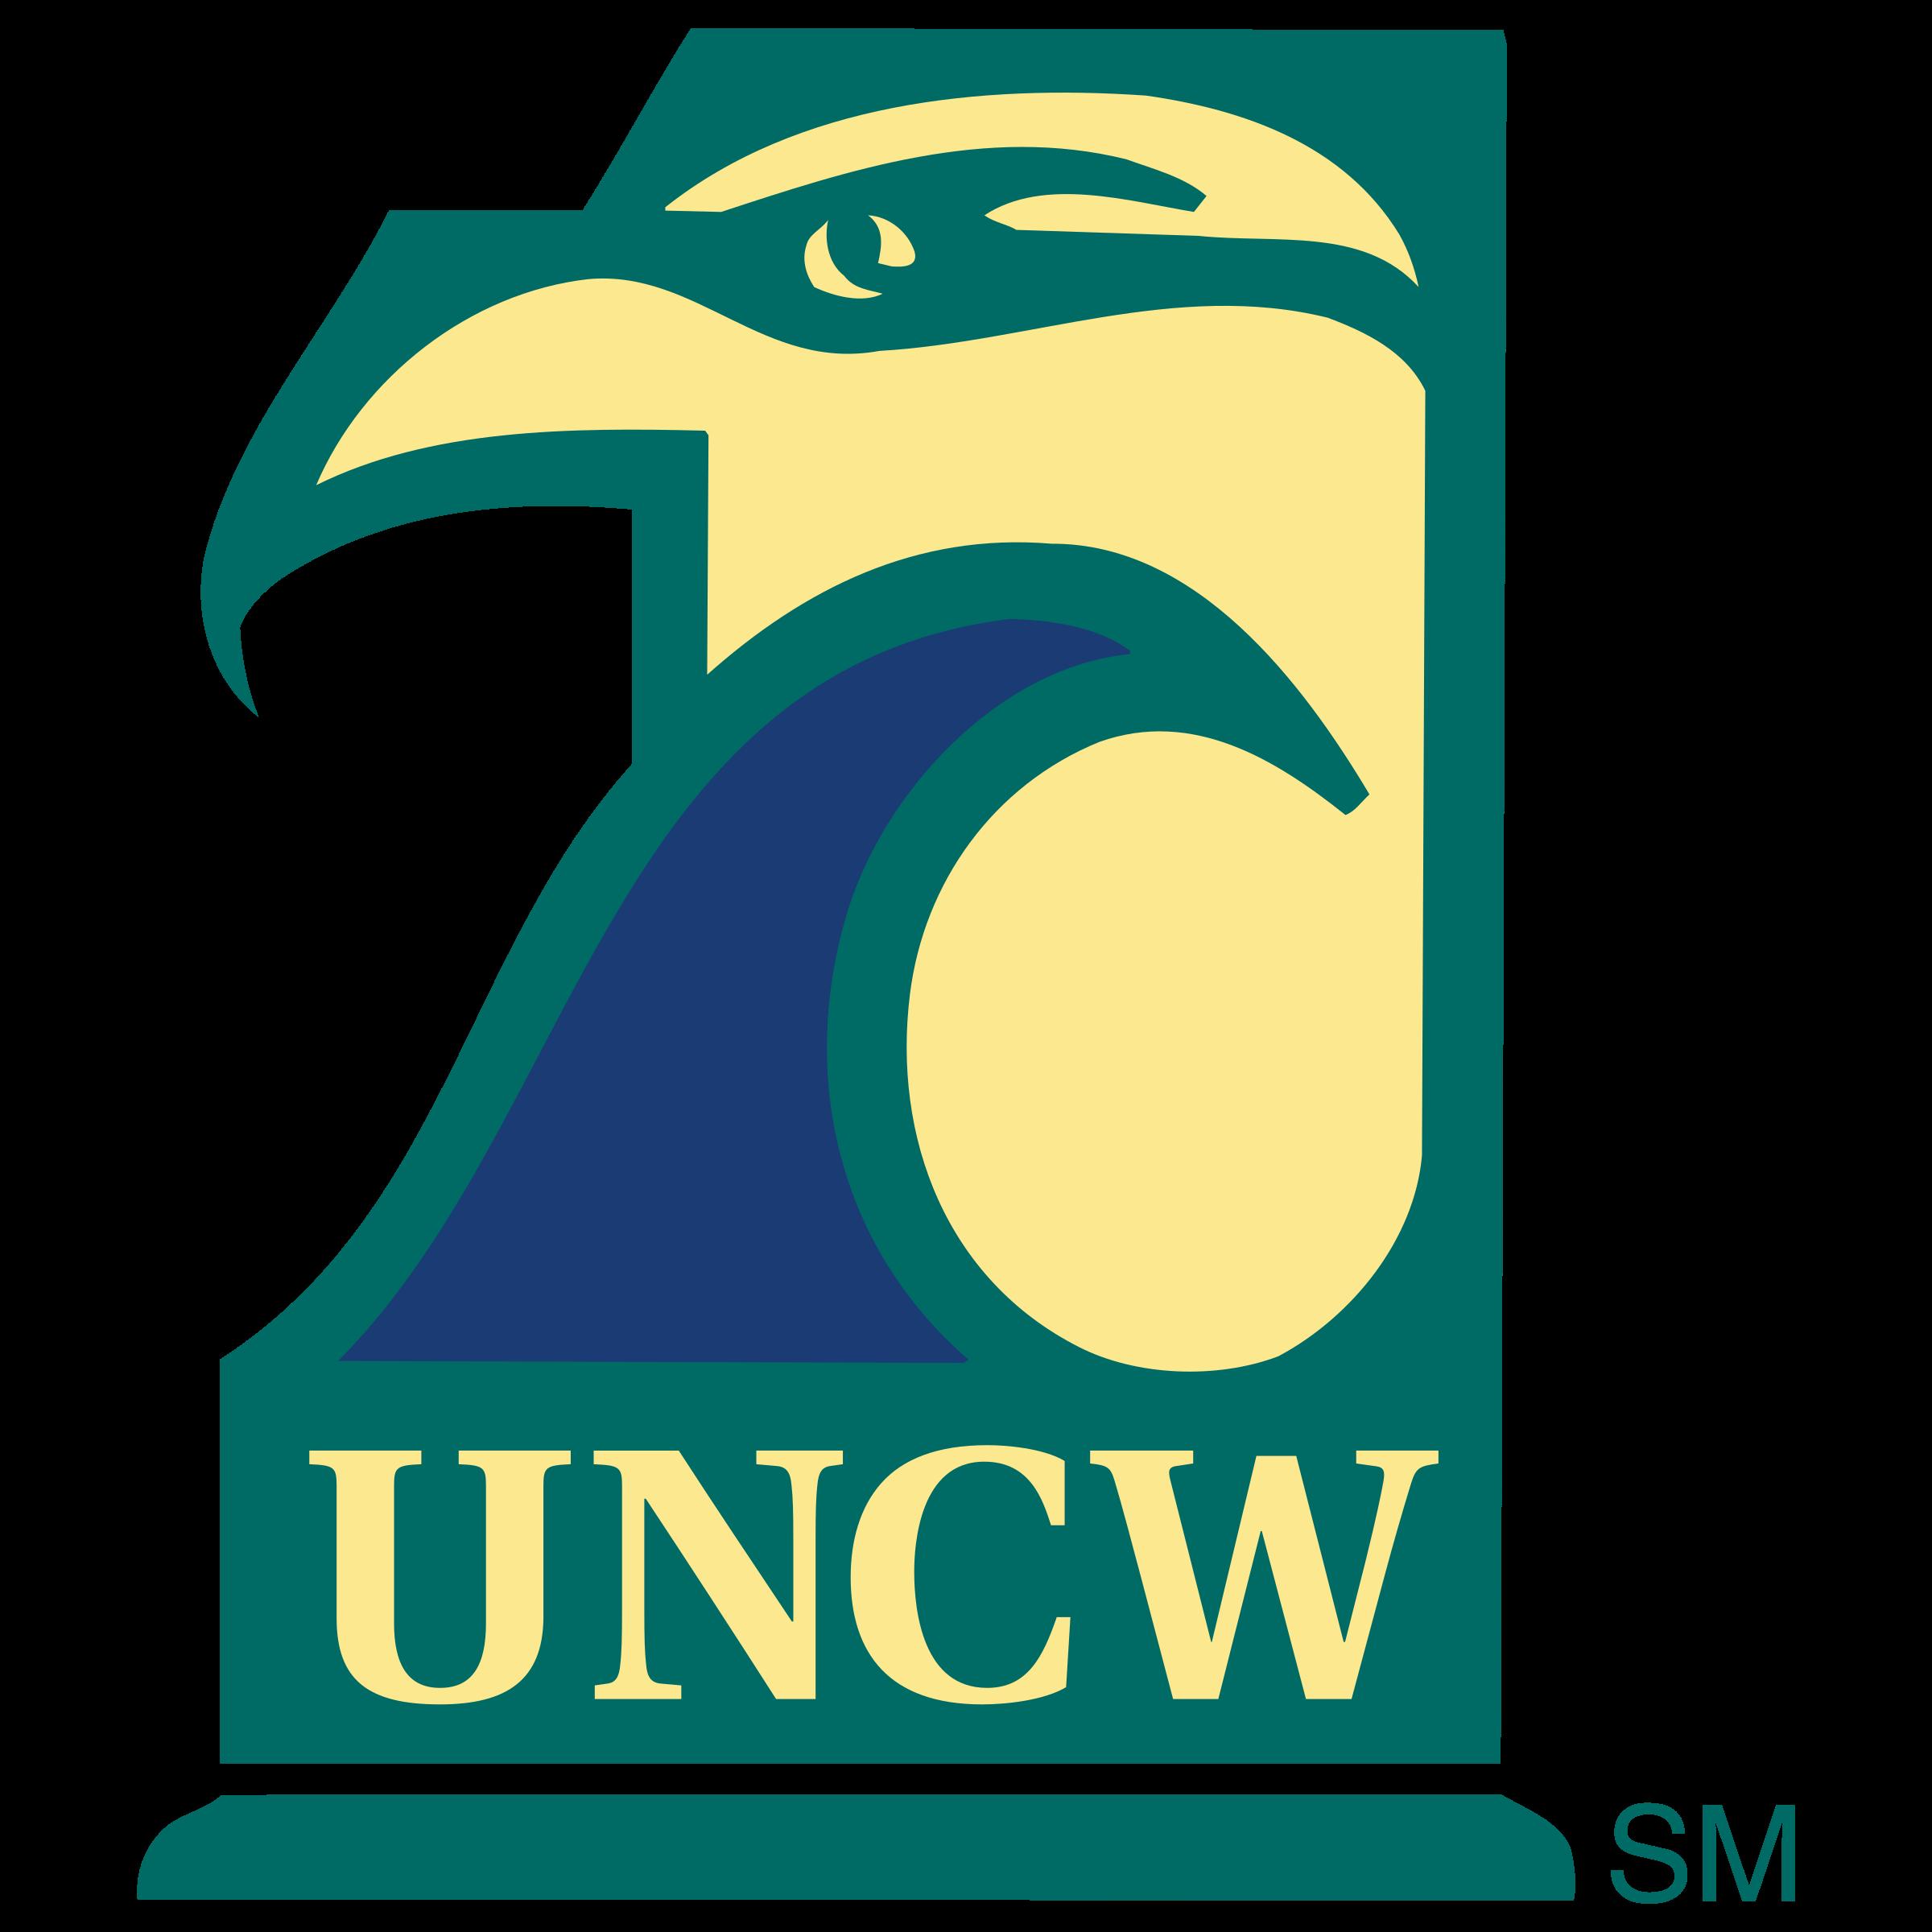 UNCW Seahawks Logo PNG Transparent & SVG Vector - Freebie ...